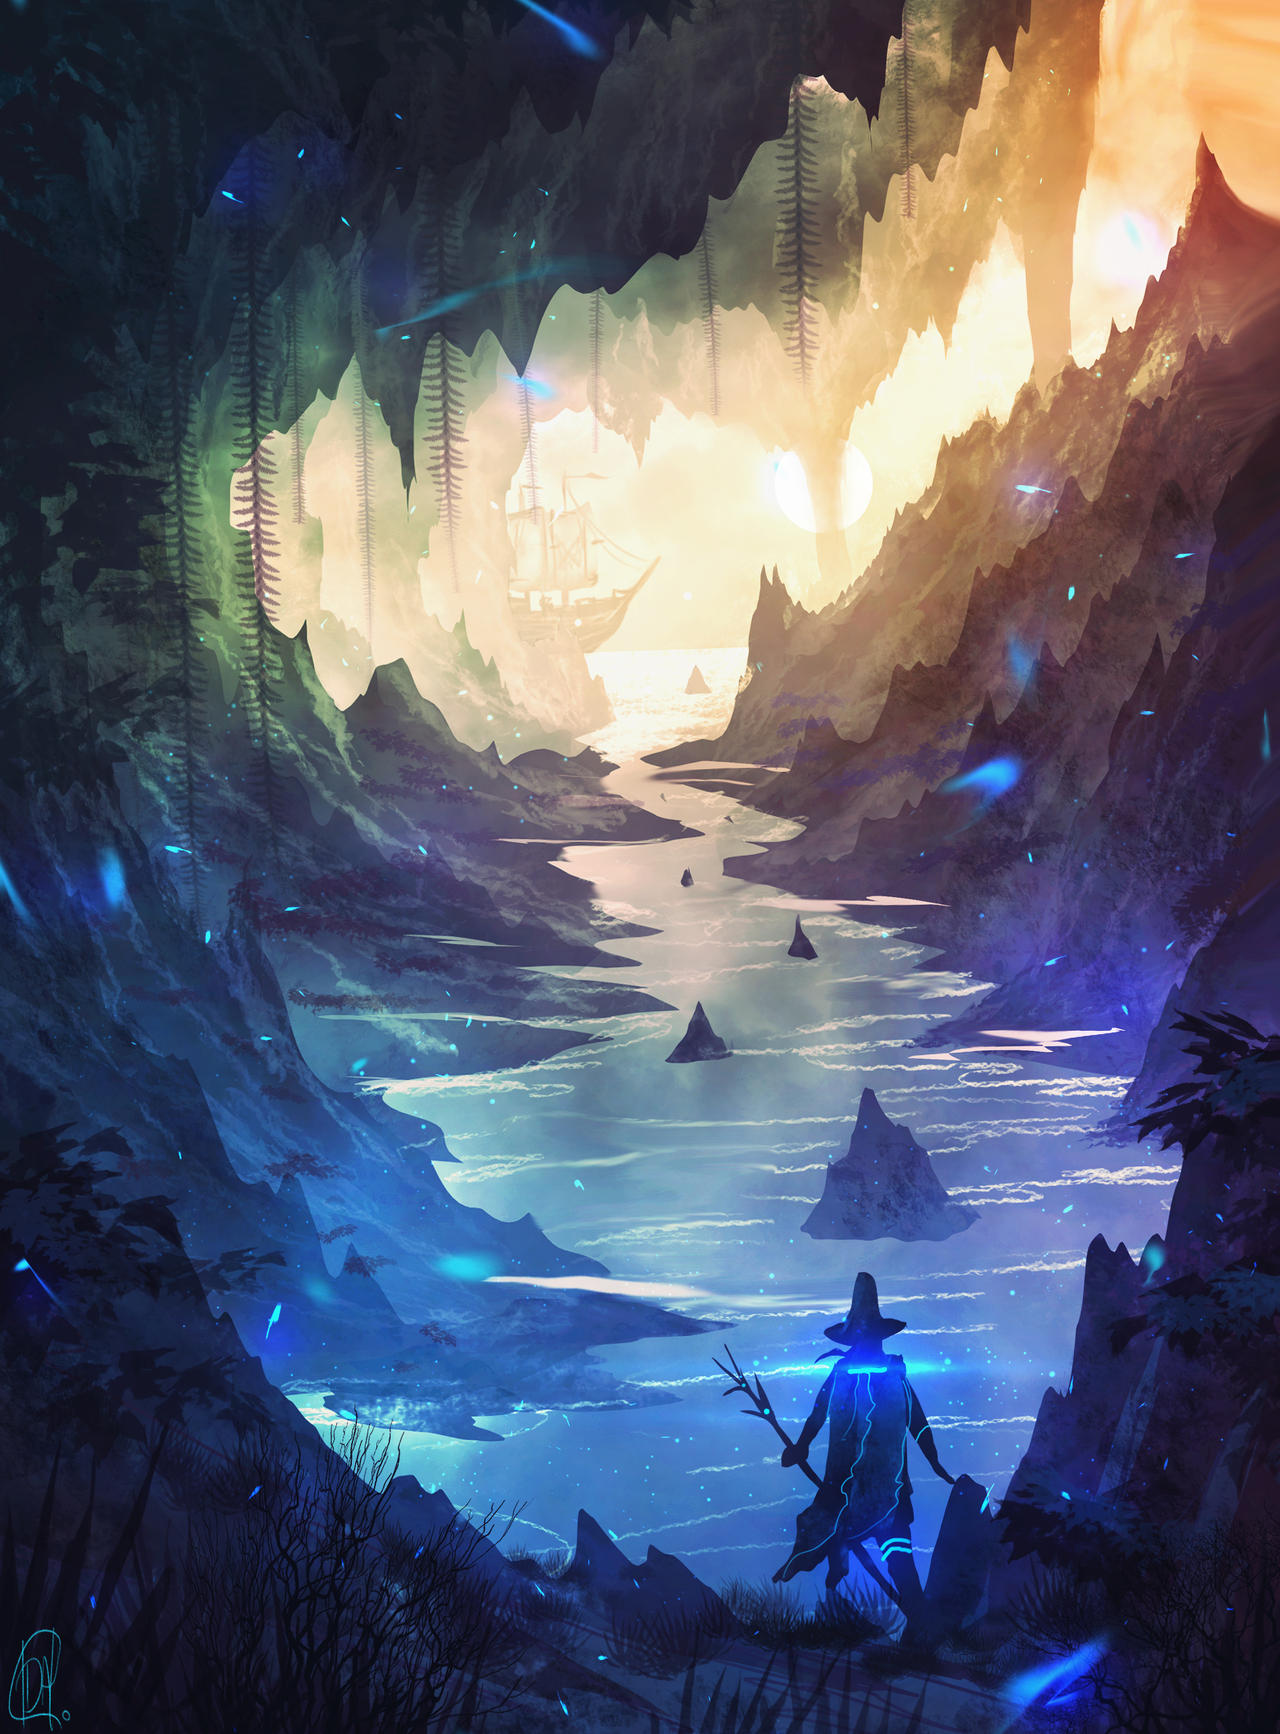 daily speedpaint 83 - sea cave (video)